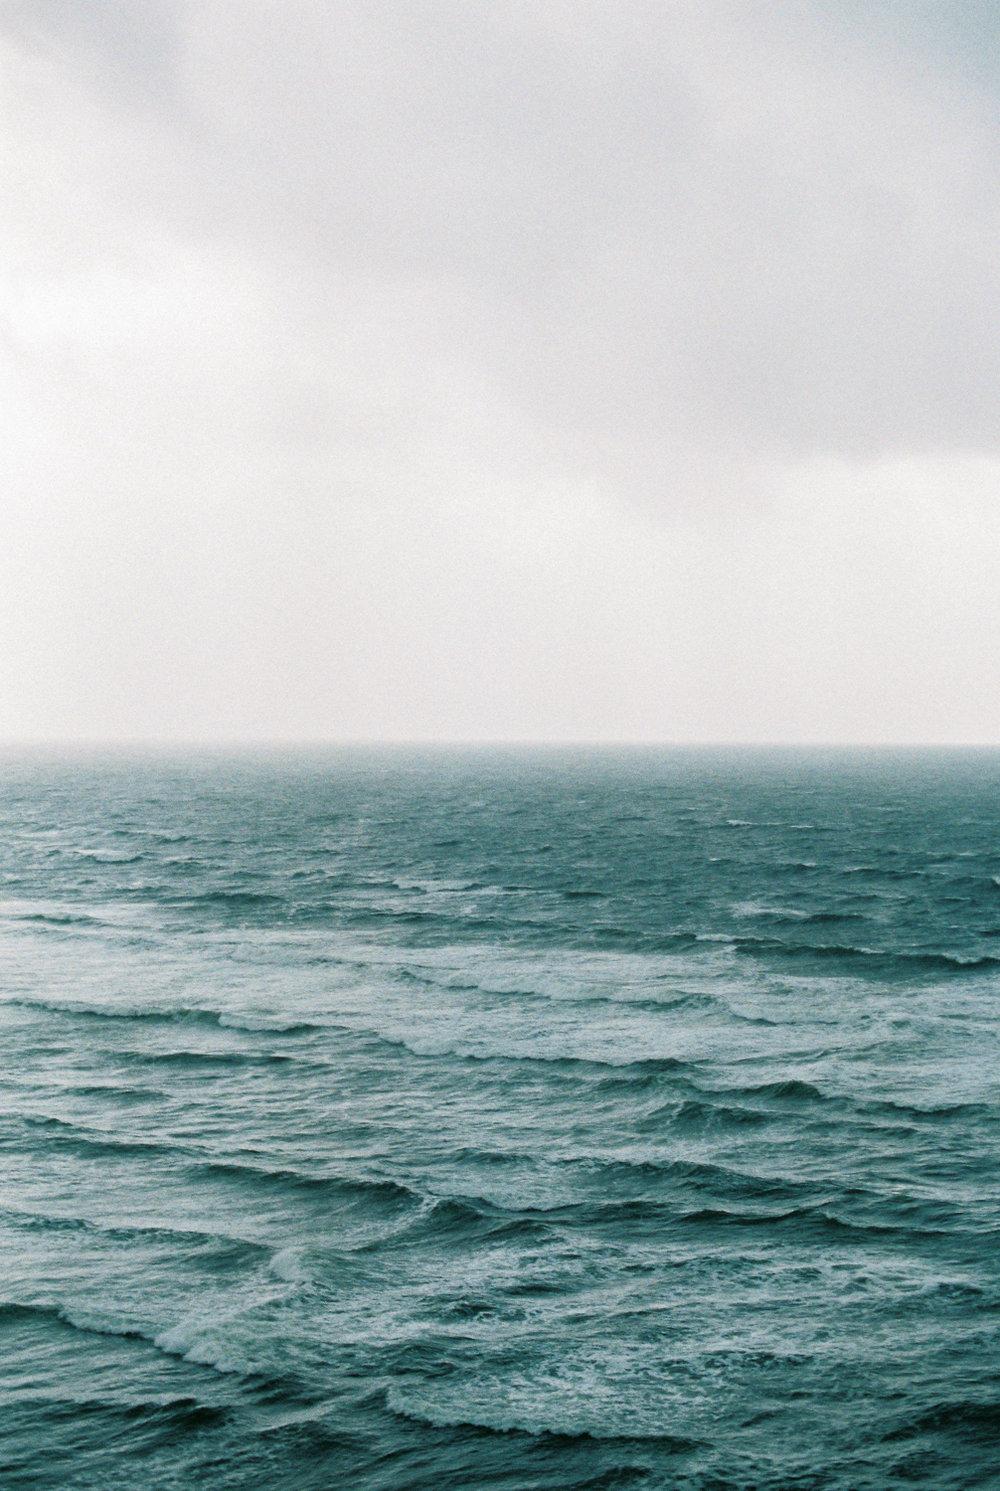 ocean waves - Cliffs of Moher, Ireland